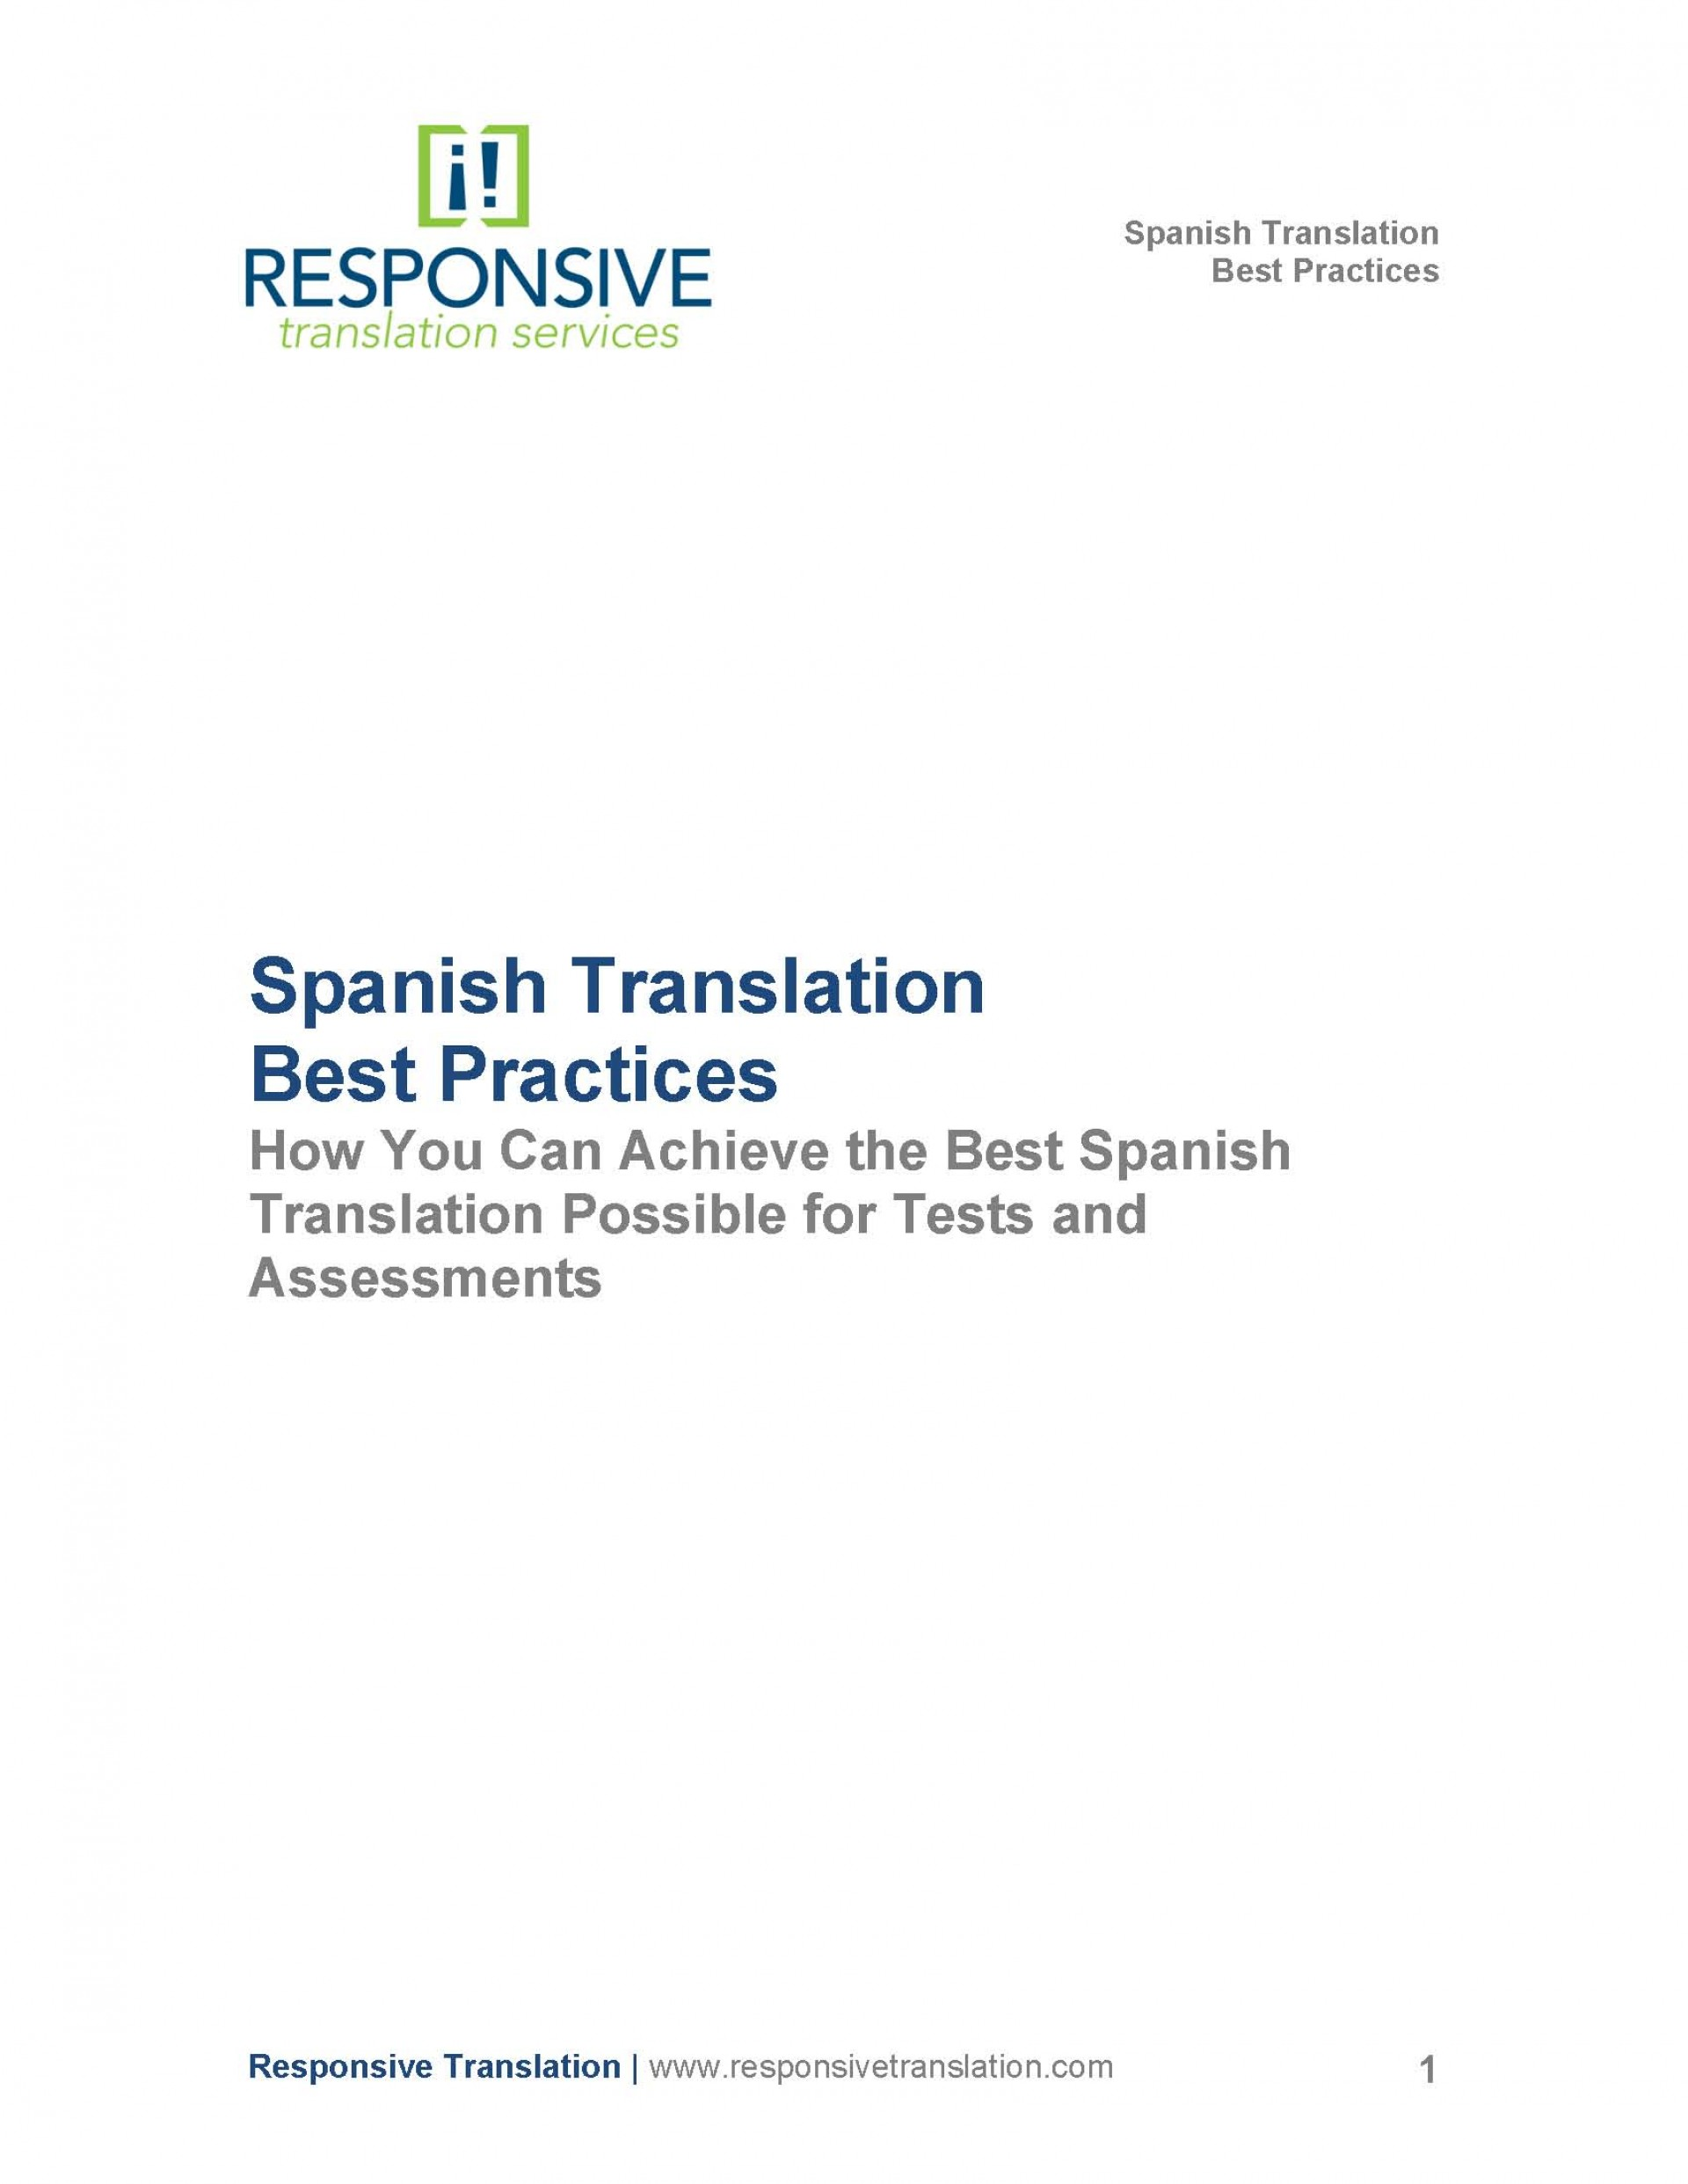 009 Essay Example Spanish White Paper Marvelous Urban Dictionary Joke Spanishdict 1920